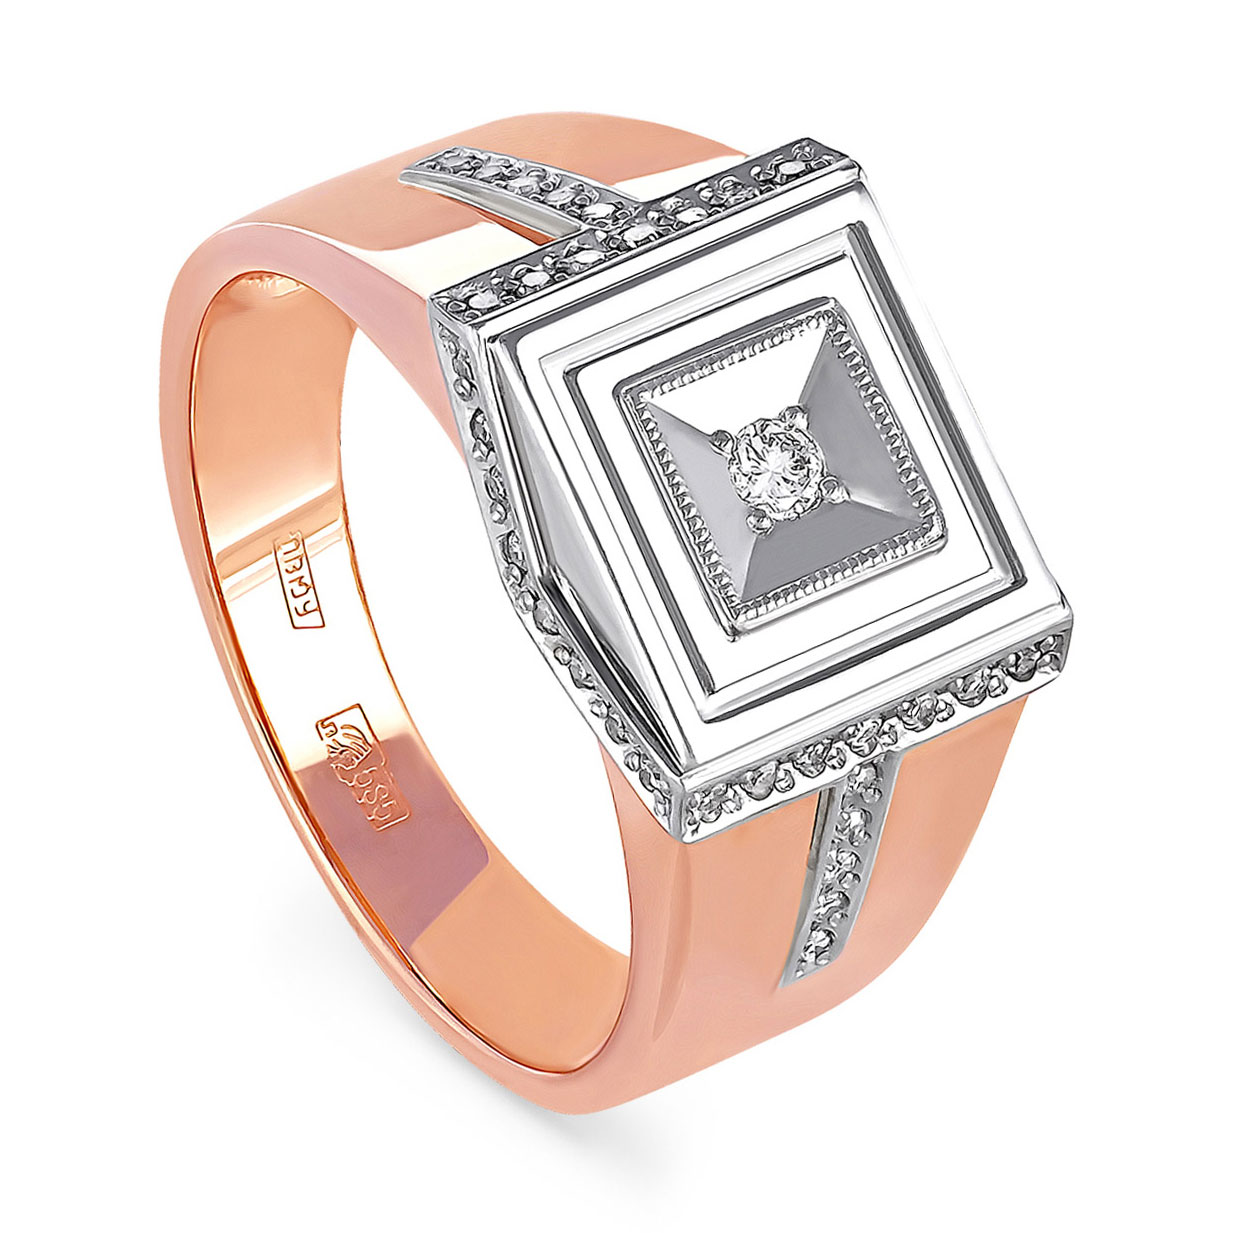 Золотое кольцо Бриллиант арт. 1-0091-1000 1-0091-1000